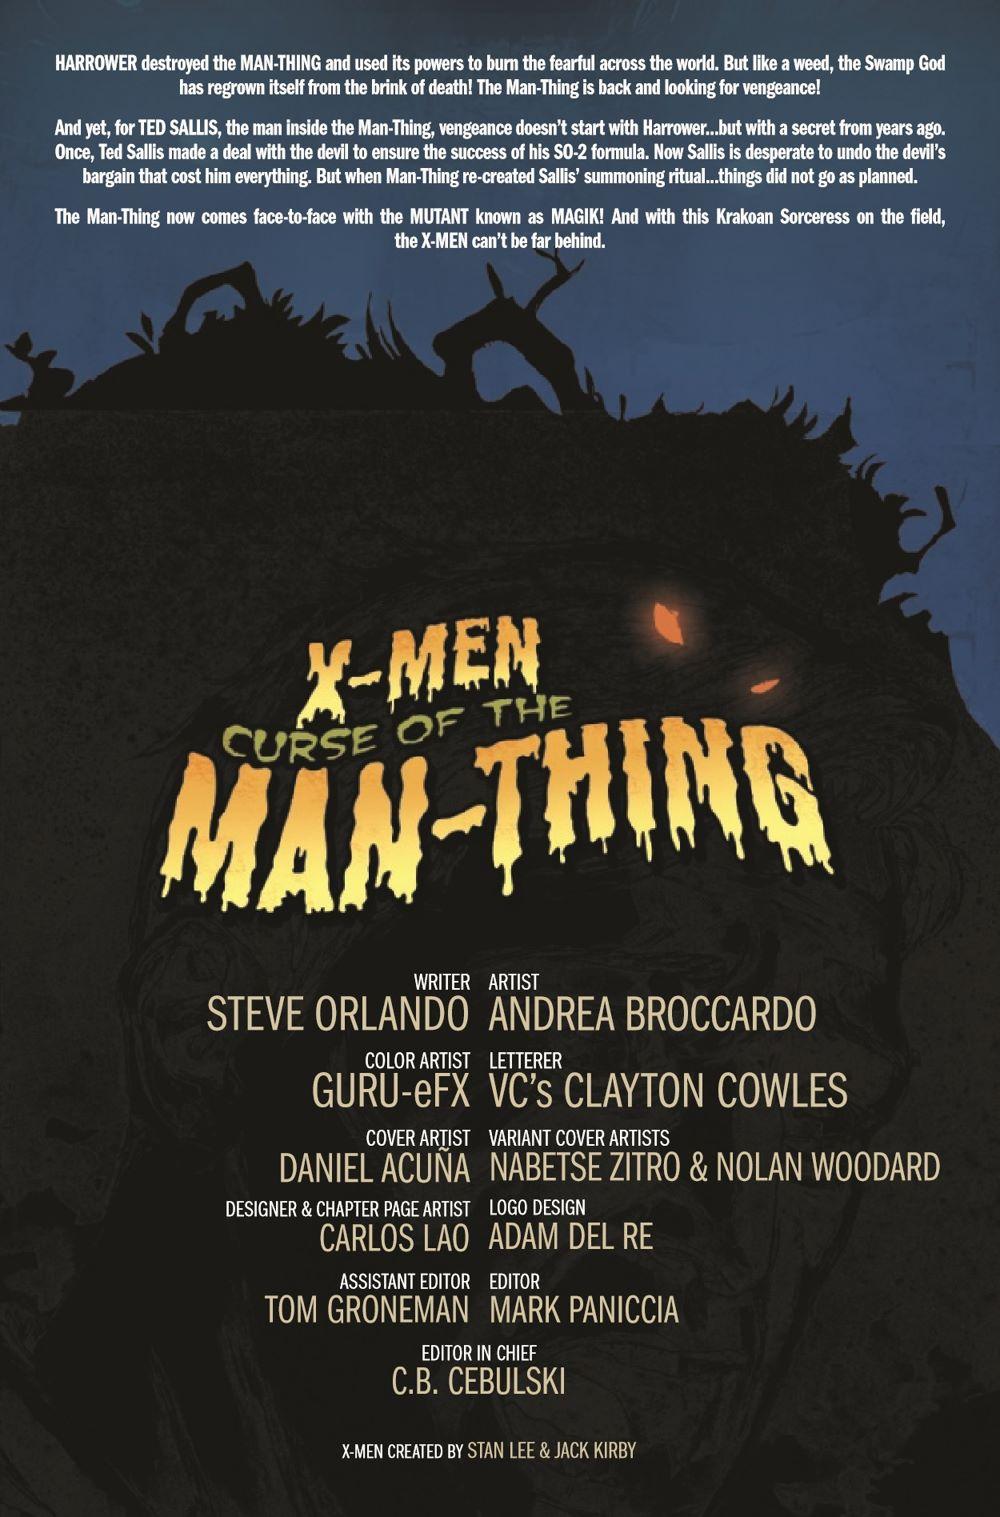 XMENMANTHINGCURSE2021001_Preview-2 ComicList Previews: X-MEN CURSE OF THE MAN-THING #1